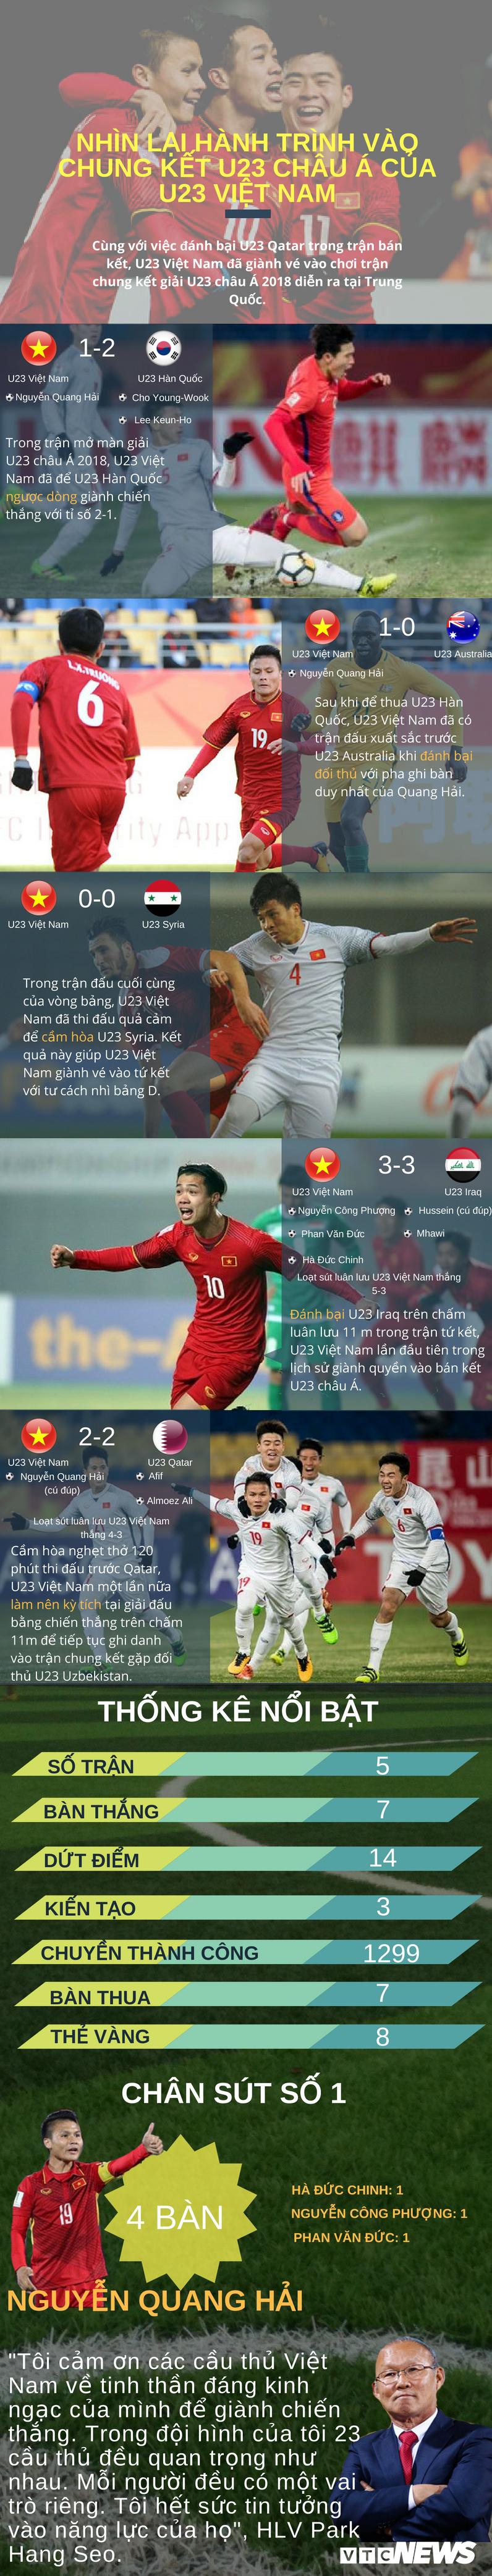 Infographic: Nhin lai hanh trinh than ky cua U23 Viet Nam tai giai chau A hinh anh 1